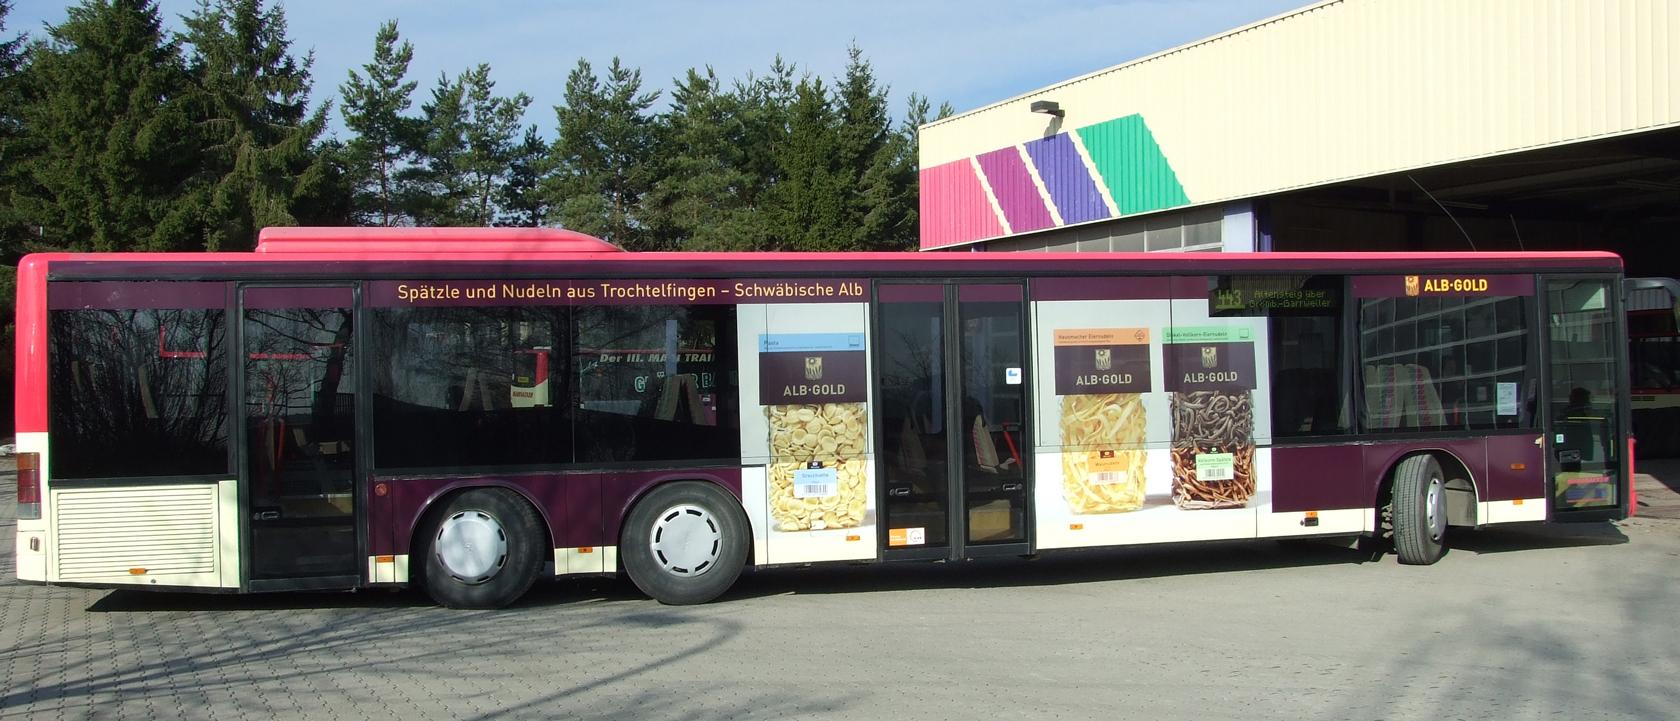 Buswerbung Tübingen